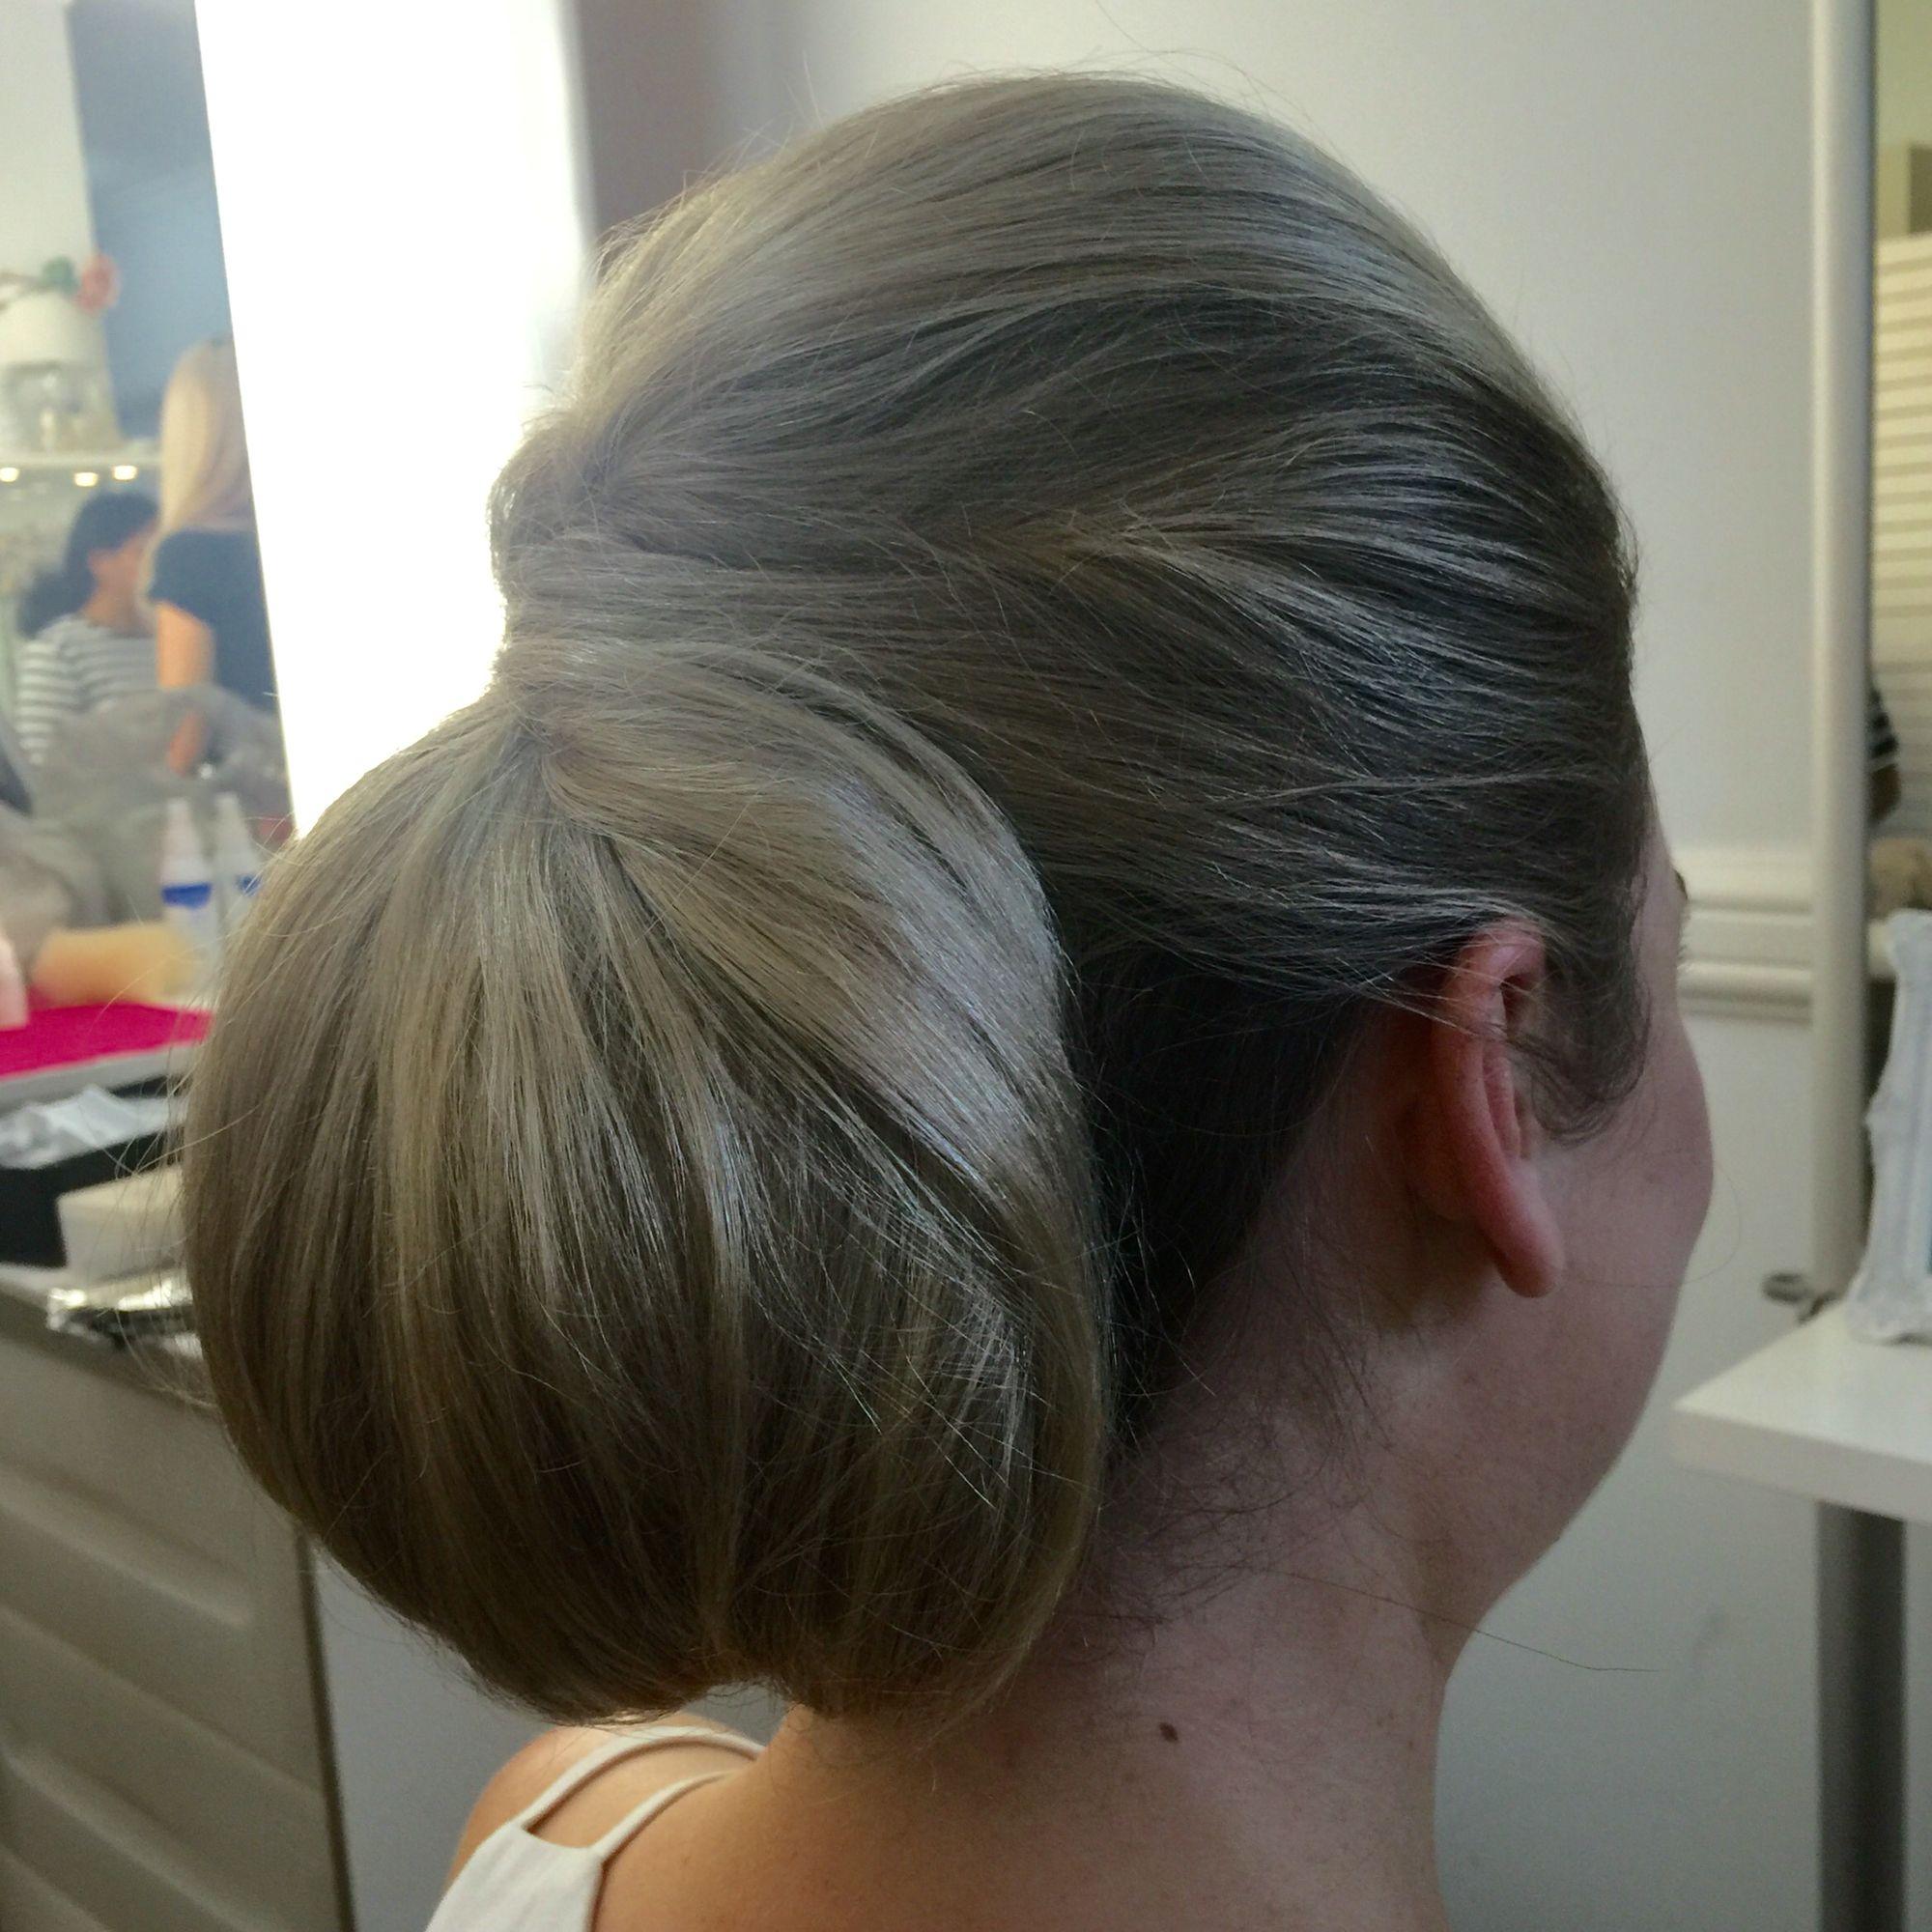 Classic clean bridal upstyle. Low bun using padding